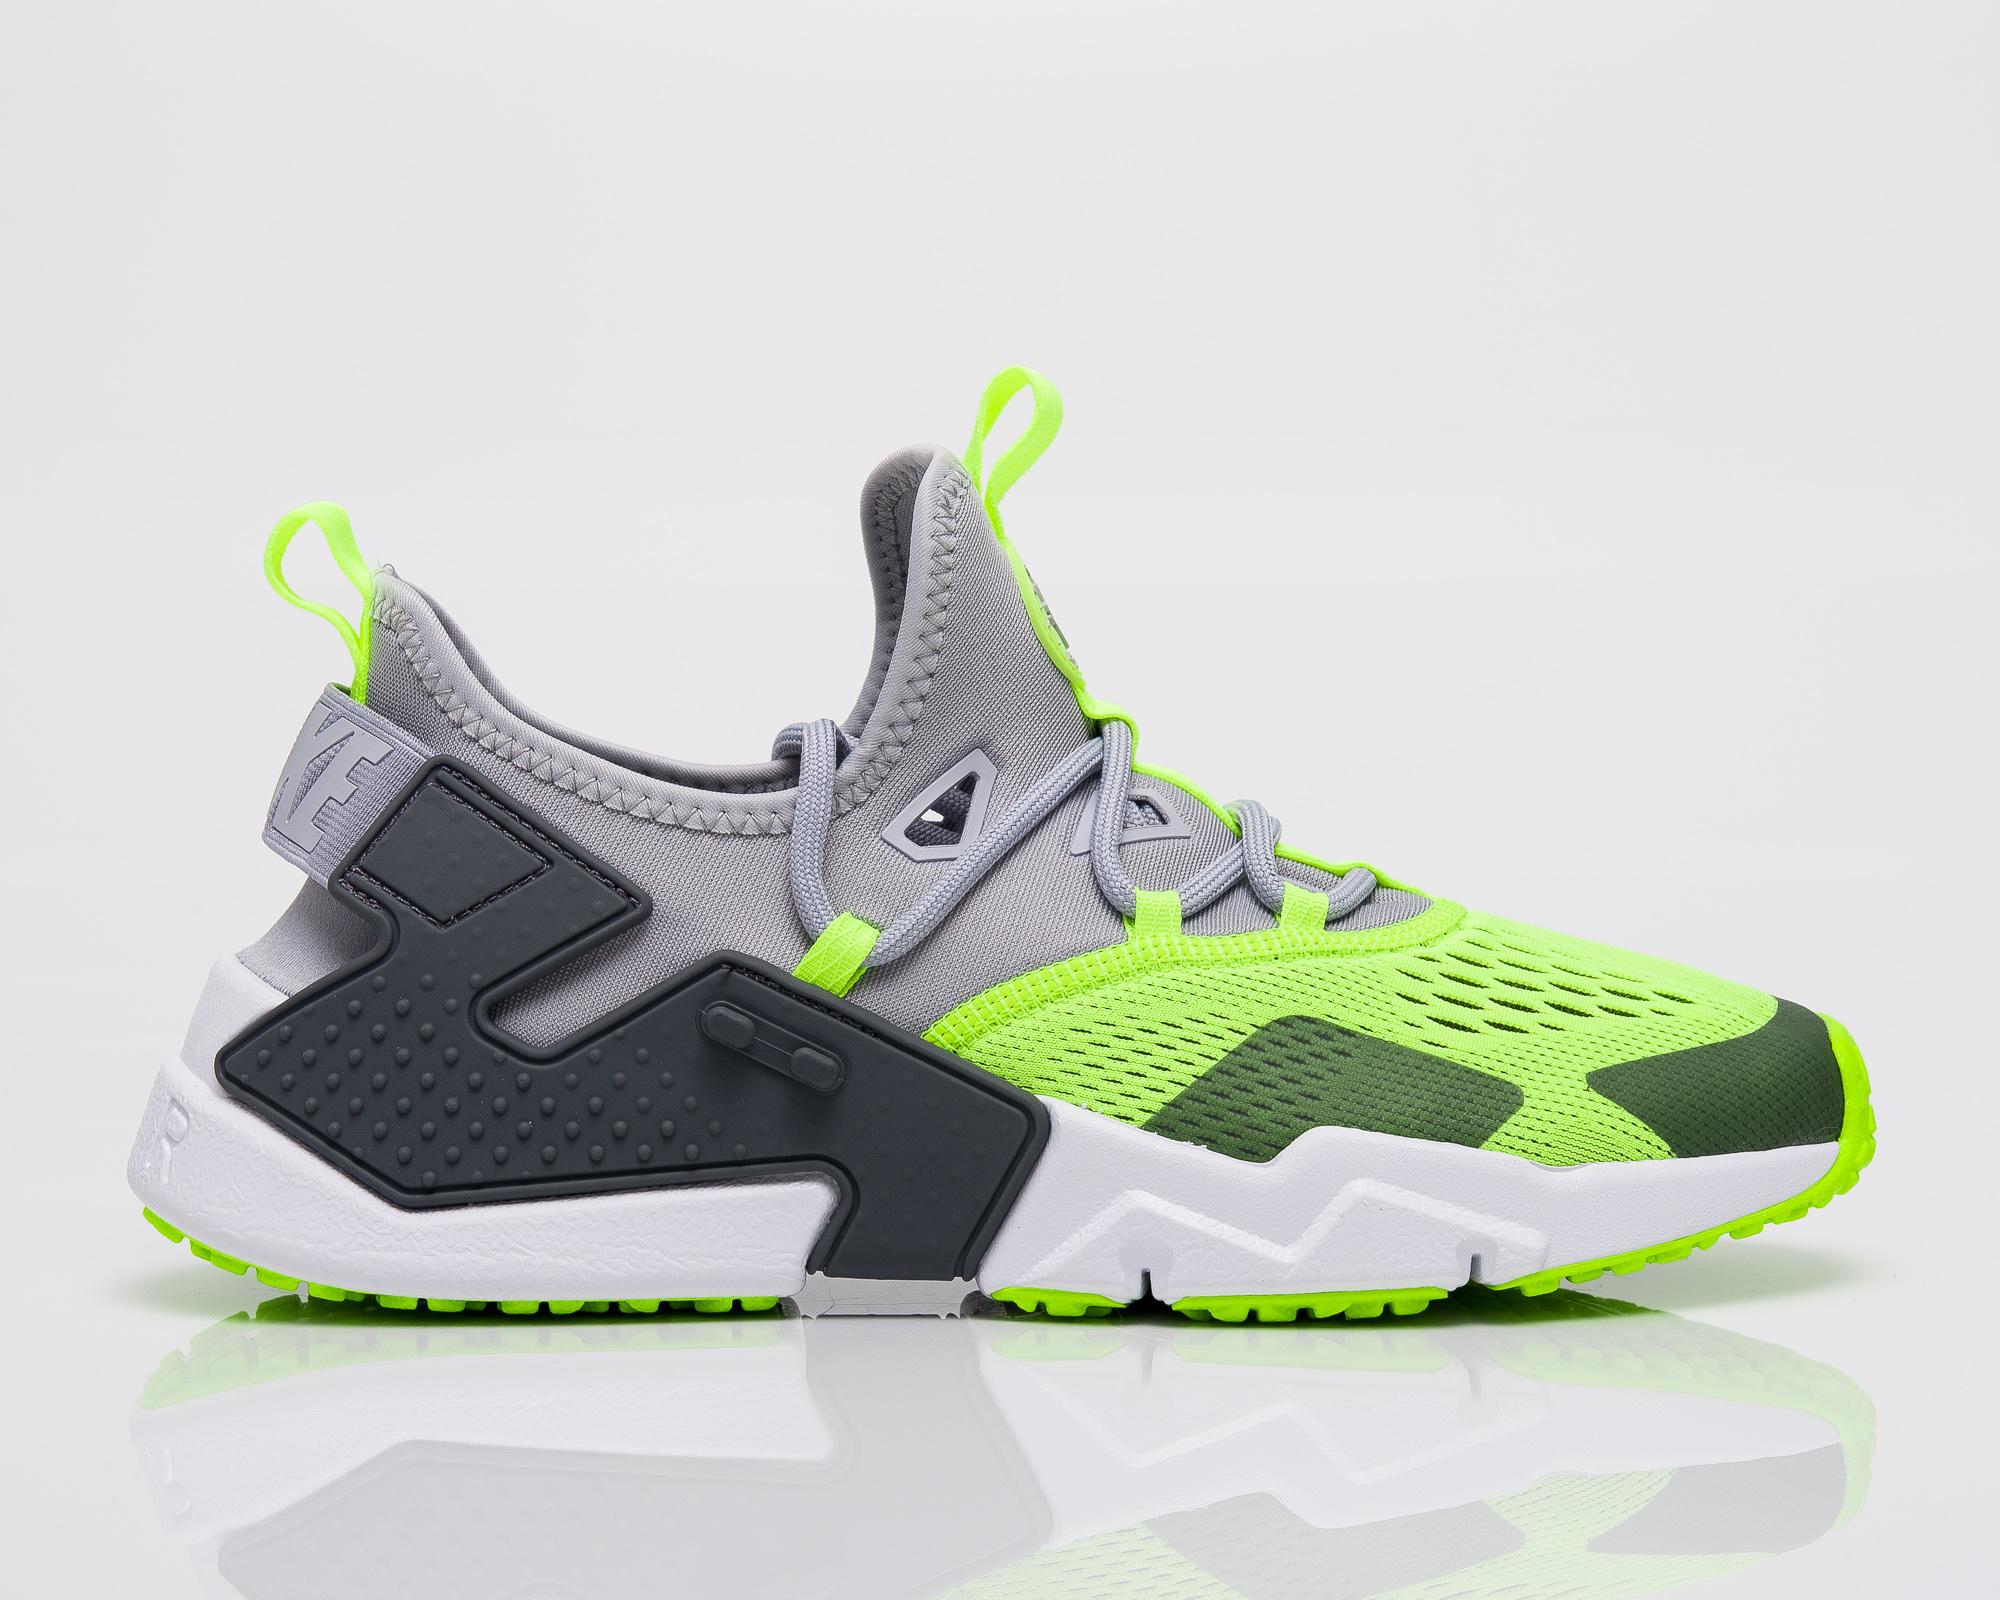 14c7b93d0db4 ... wolf cool grey black 54f38 84853  50% off nike air huarache drift  breathe shoes casual sporting goods sil.lt e3678